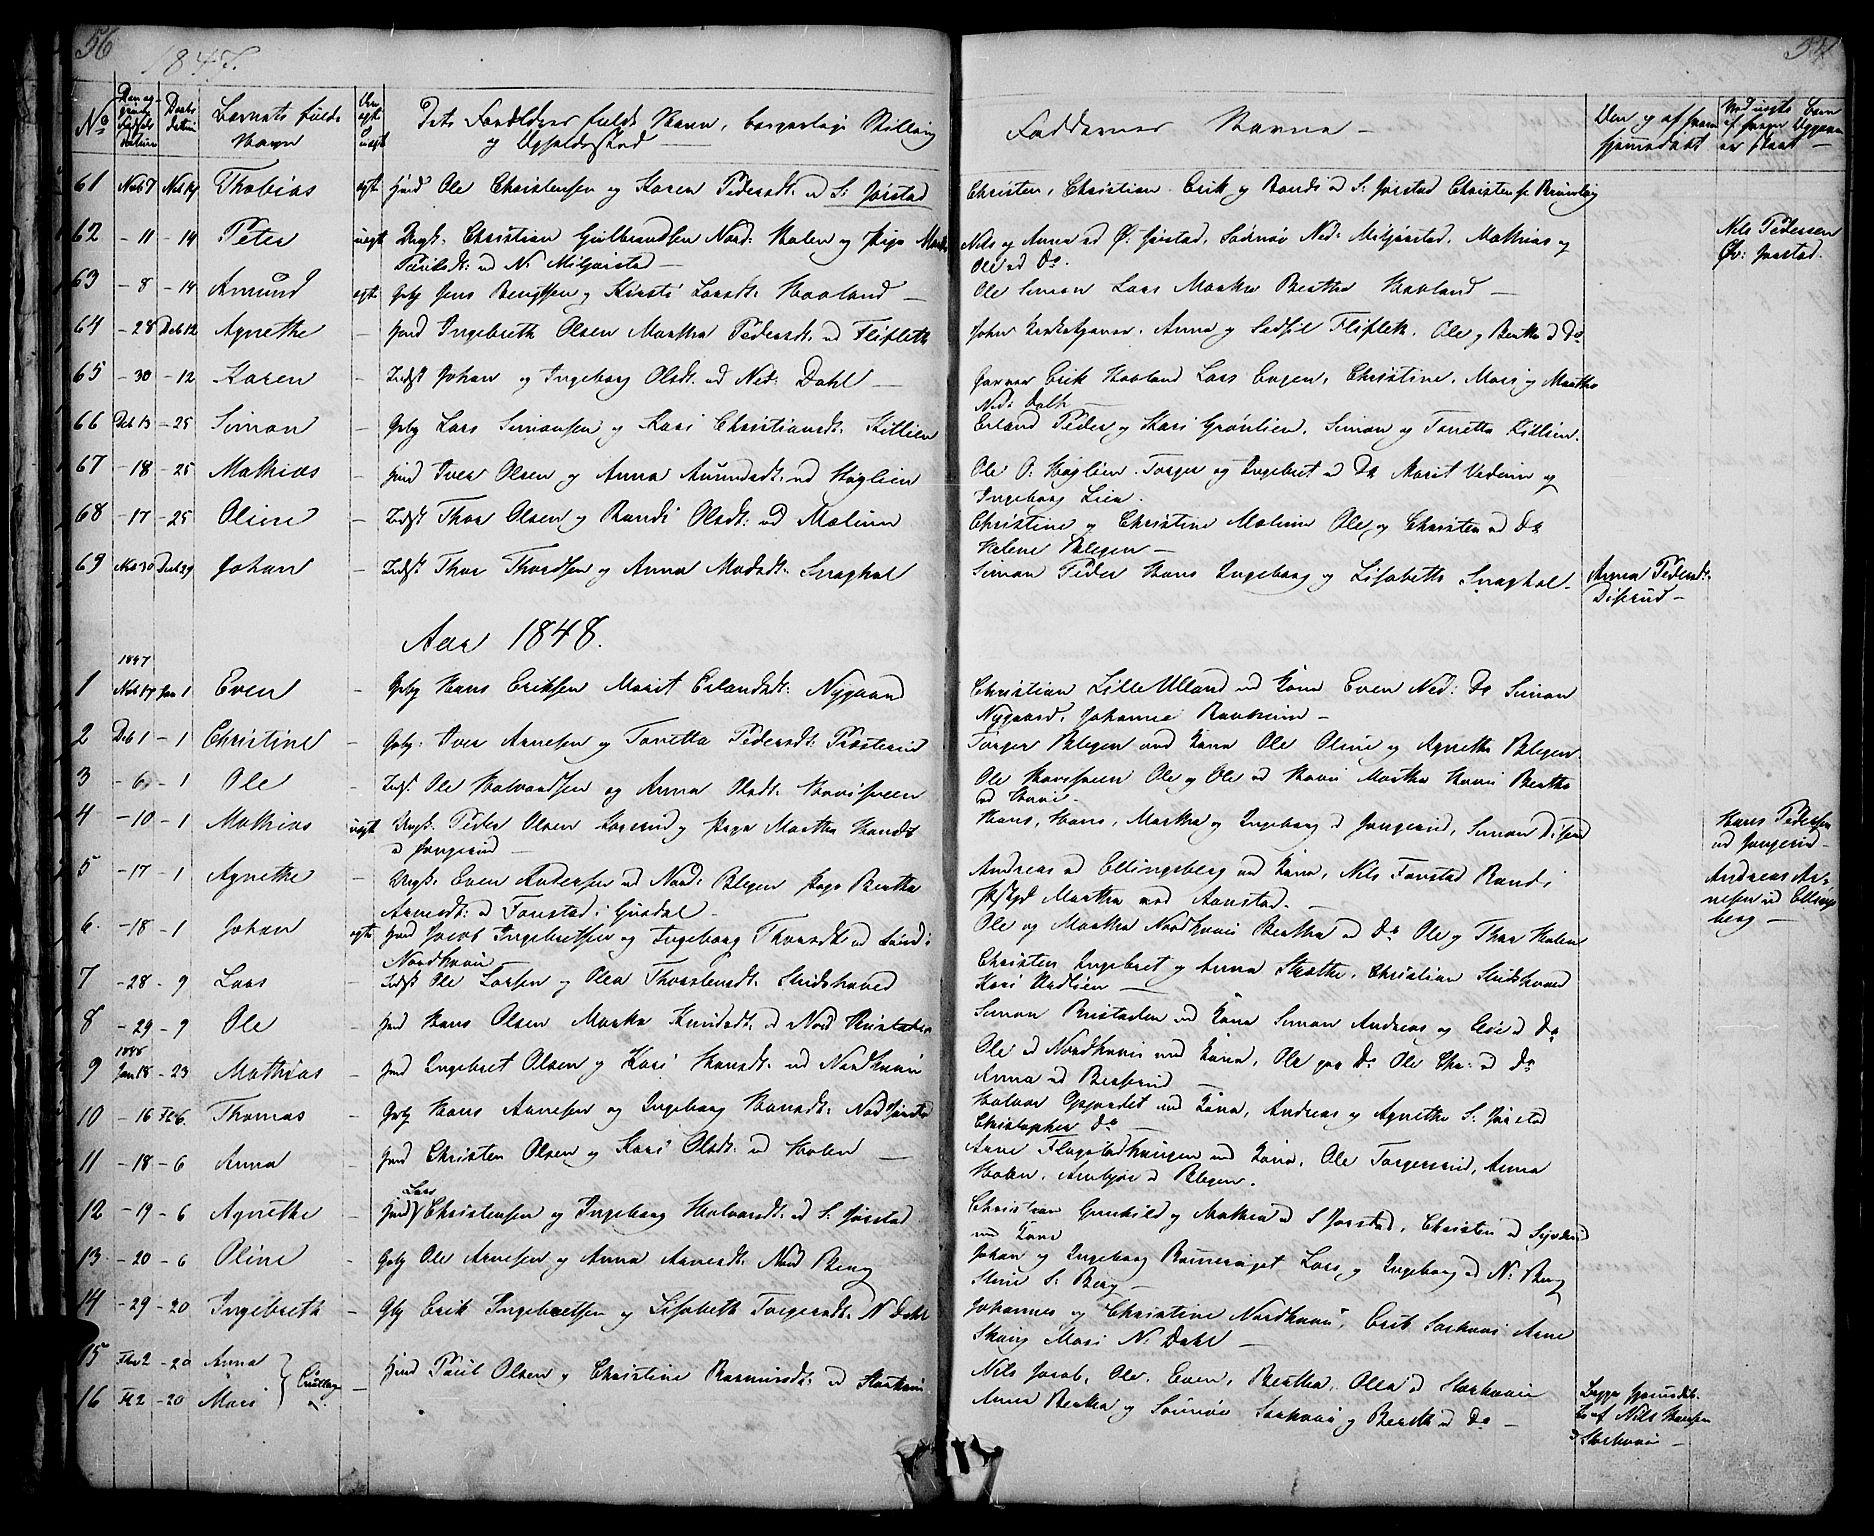 SAH, Fåberg prestekontor, Klokkerbok nr. 5, 1837-1864, s. 56-57